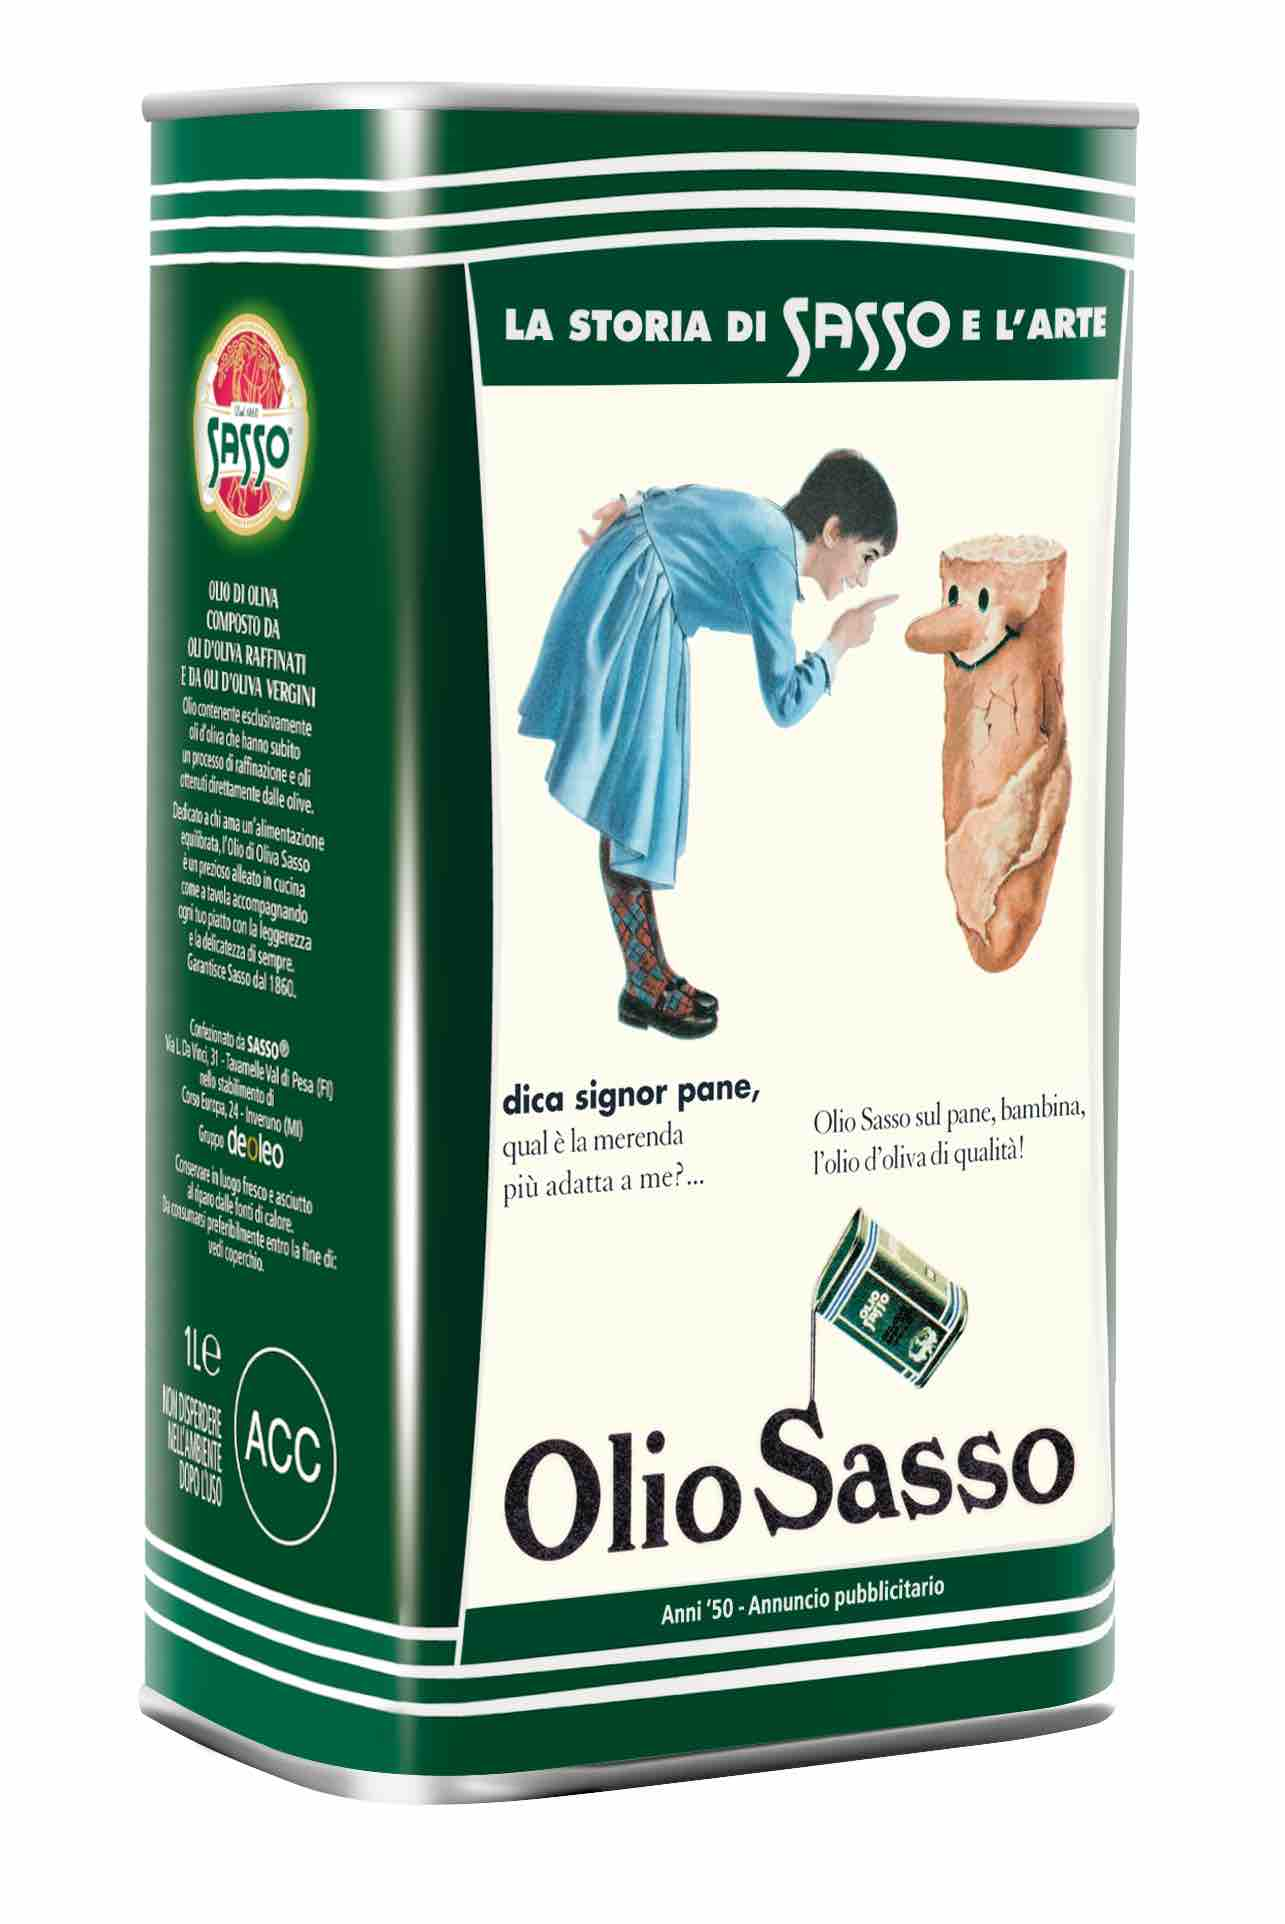 03_Sasso Oliva 1L storica - pane